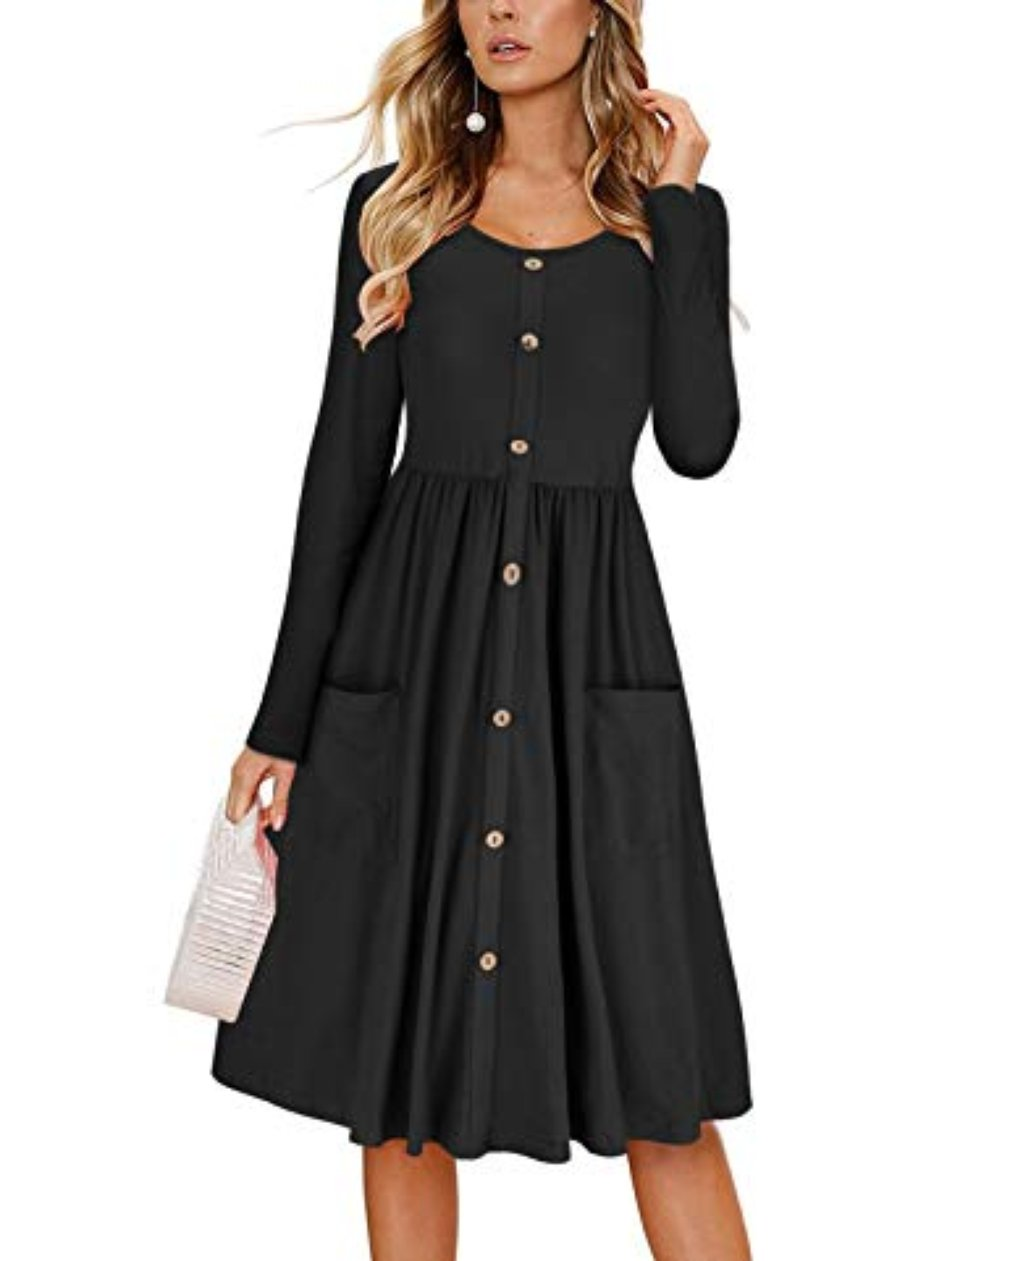 Fashion Womens Denim Dress Summer Long Sleeve Casual Loose Tops Mini Shirt Dress